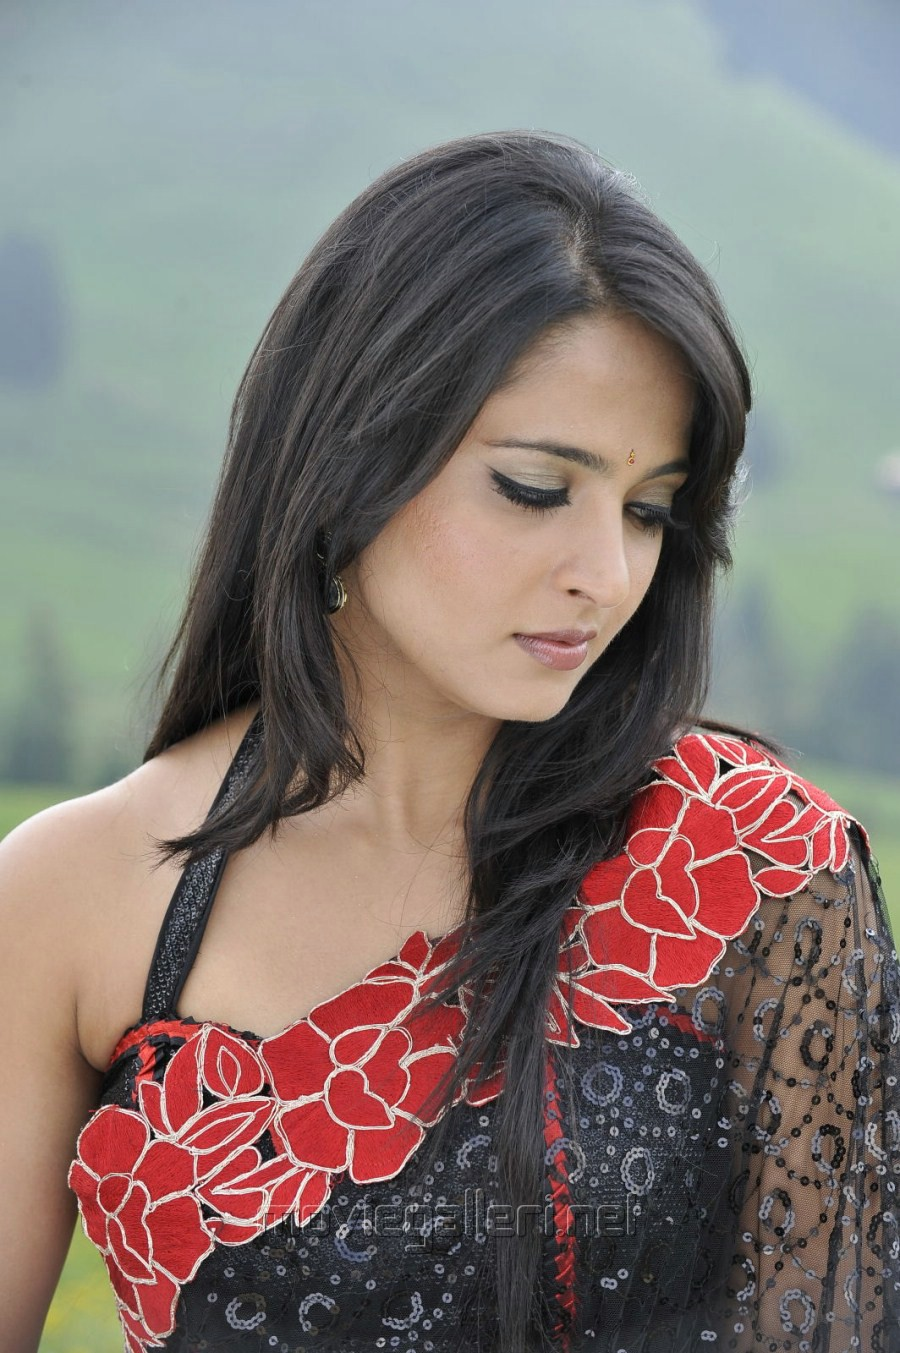 Anushka shetty anushka shetty hot stills pictures beautiful pictures - Beautiful Anushka Shetty In Saree Photos From Damarukam Movie